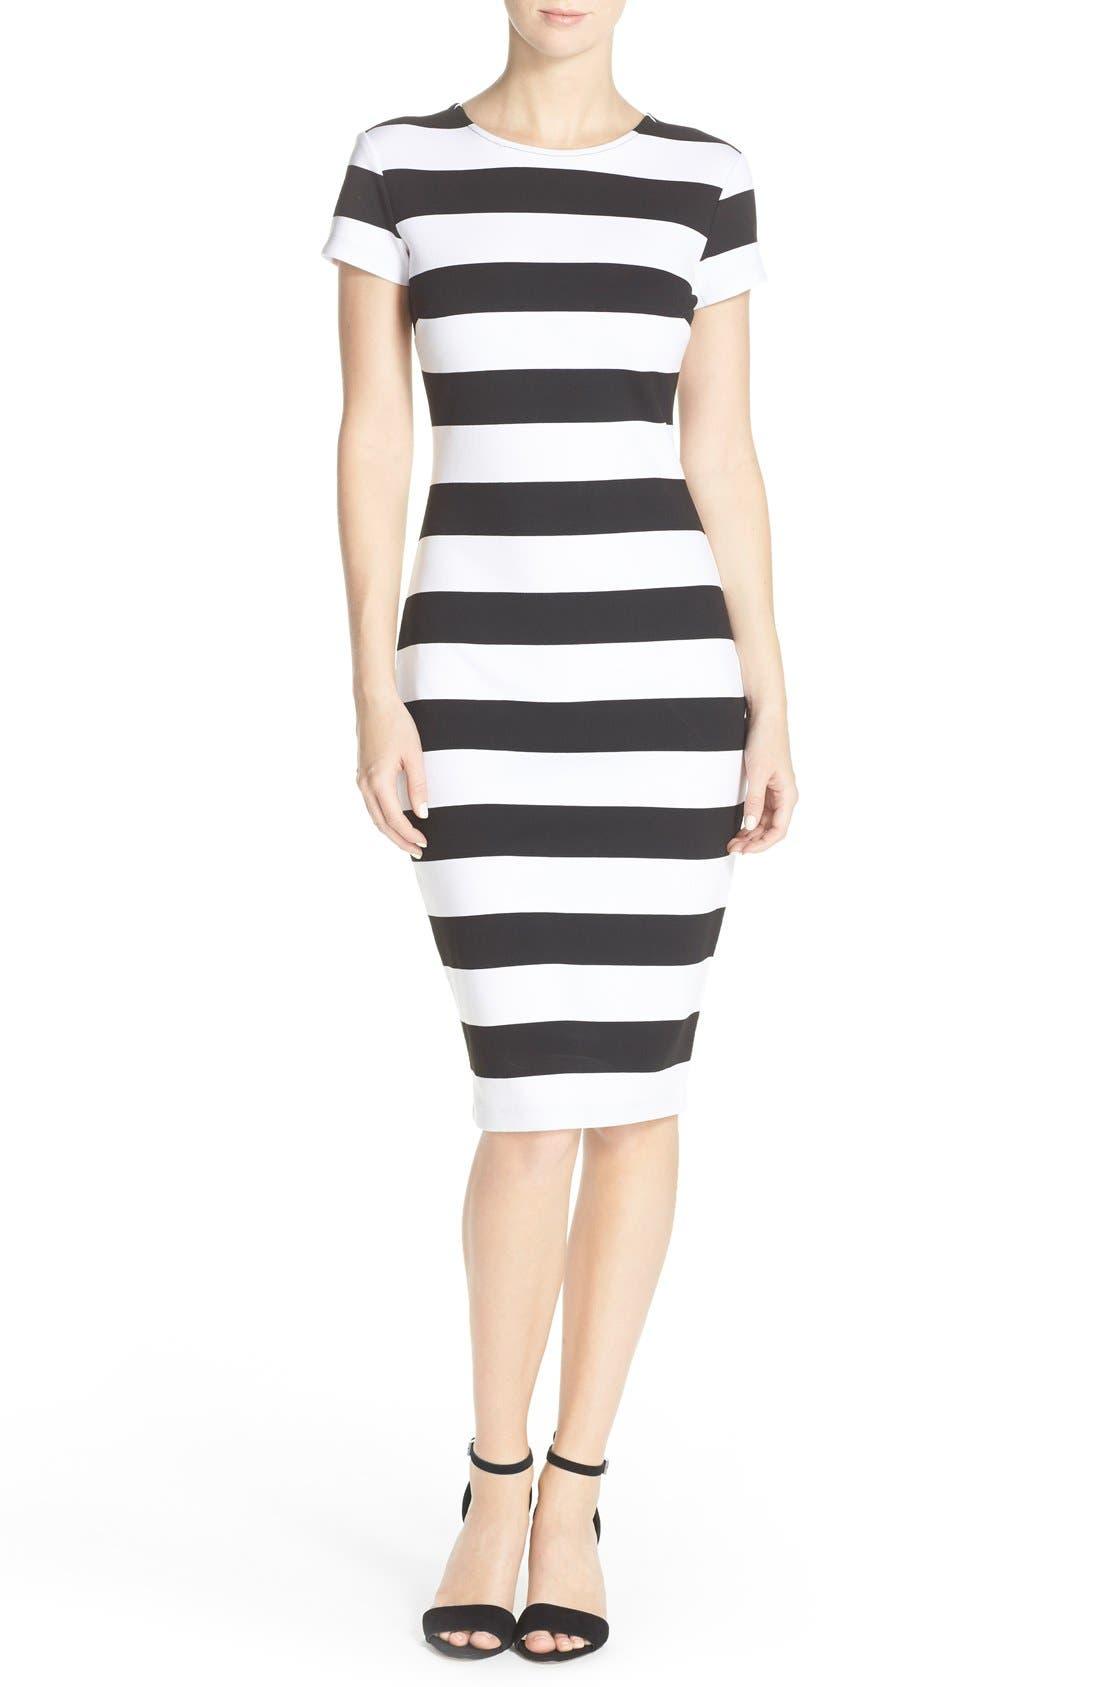 Alternate Image 1 Selected - Felicity & Coco Stripe Midi Sheath Dress (Nordstrom Exclusive)